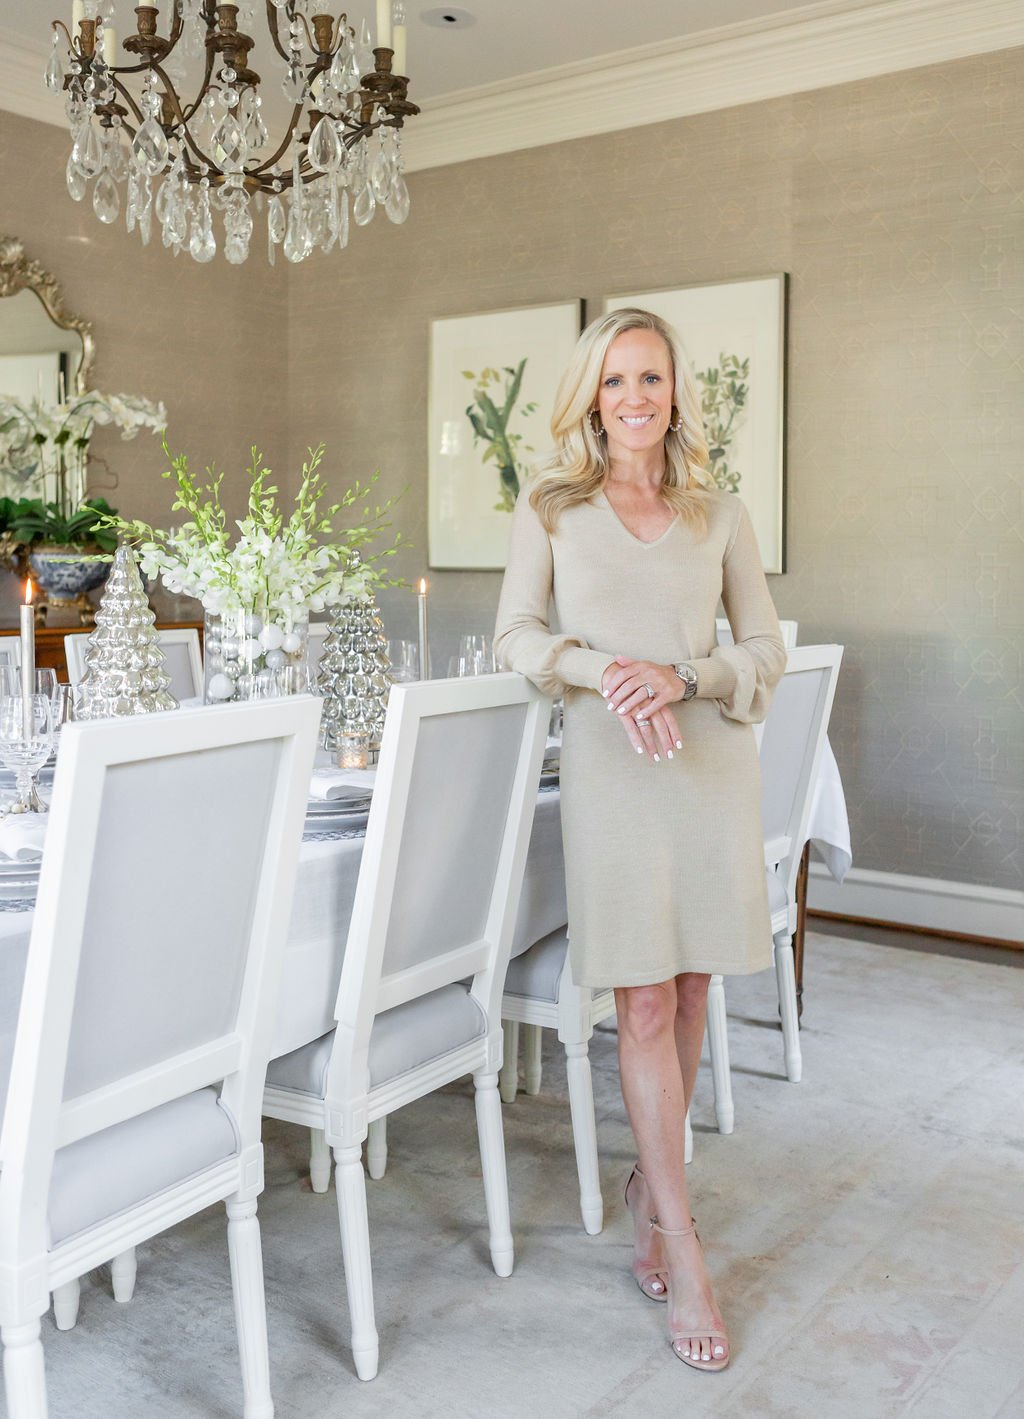 Alicia Wood, Dallas Lifestyle Expert, Dallas Fashion blogger, Dallas Lifestyle Blog, Lilly Pulitzer Gold dress